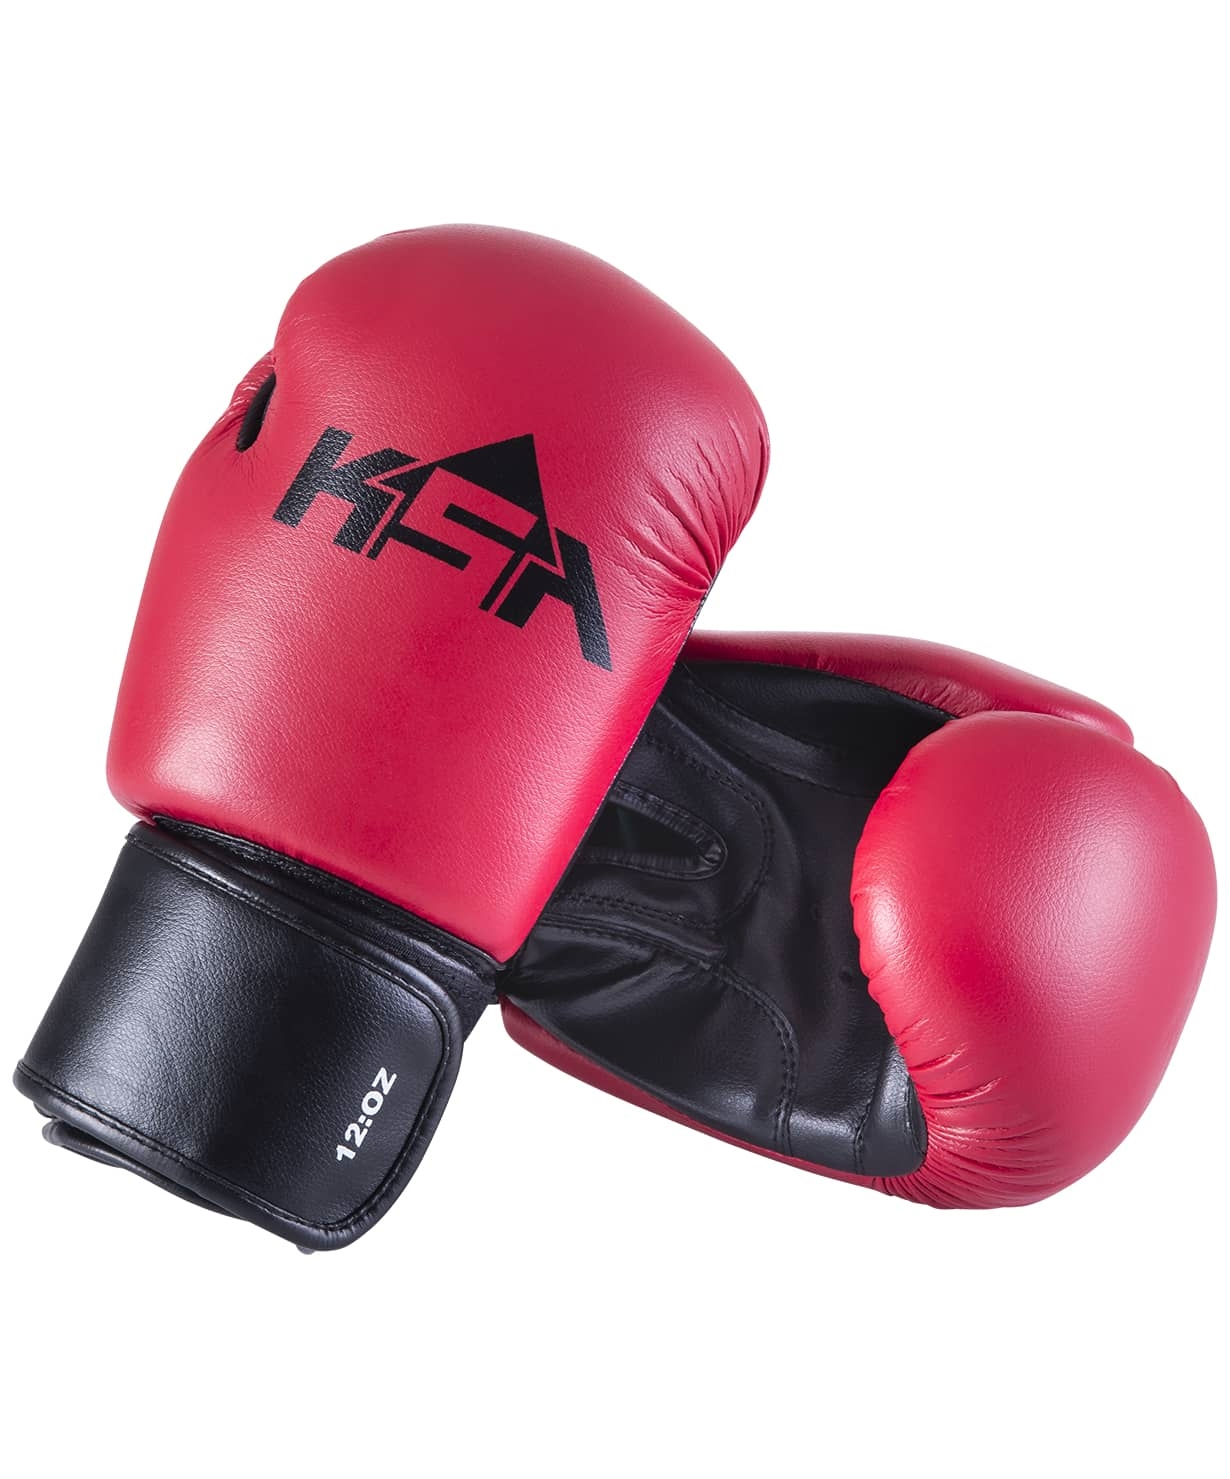 Перчатки боксерские Spider Red, к/з, 12 oz